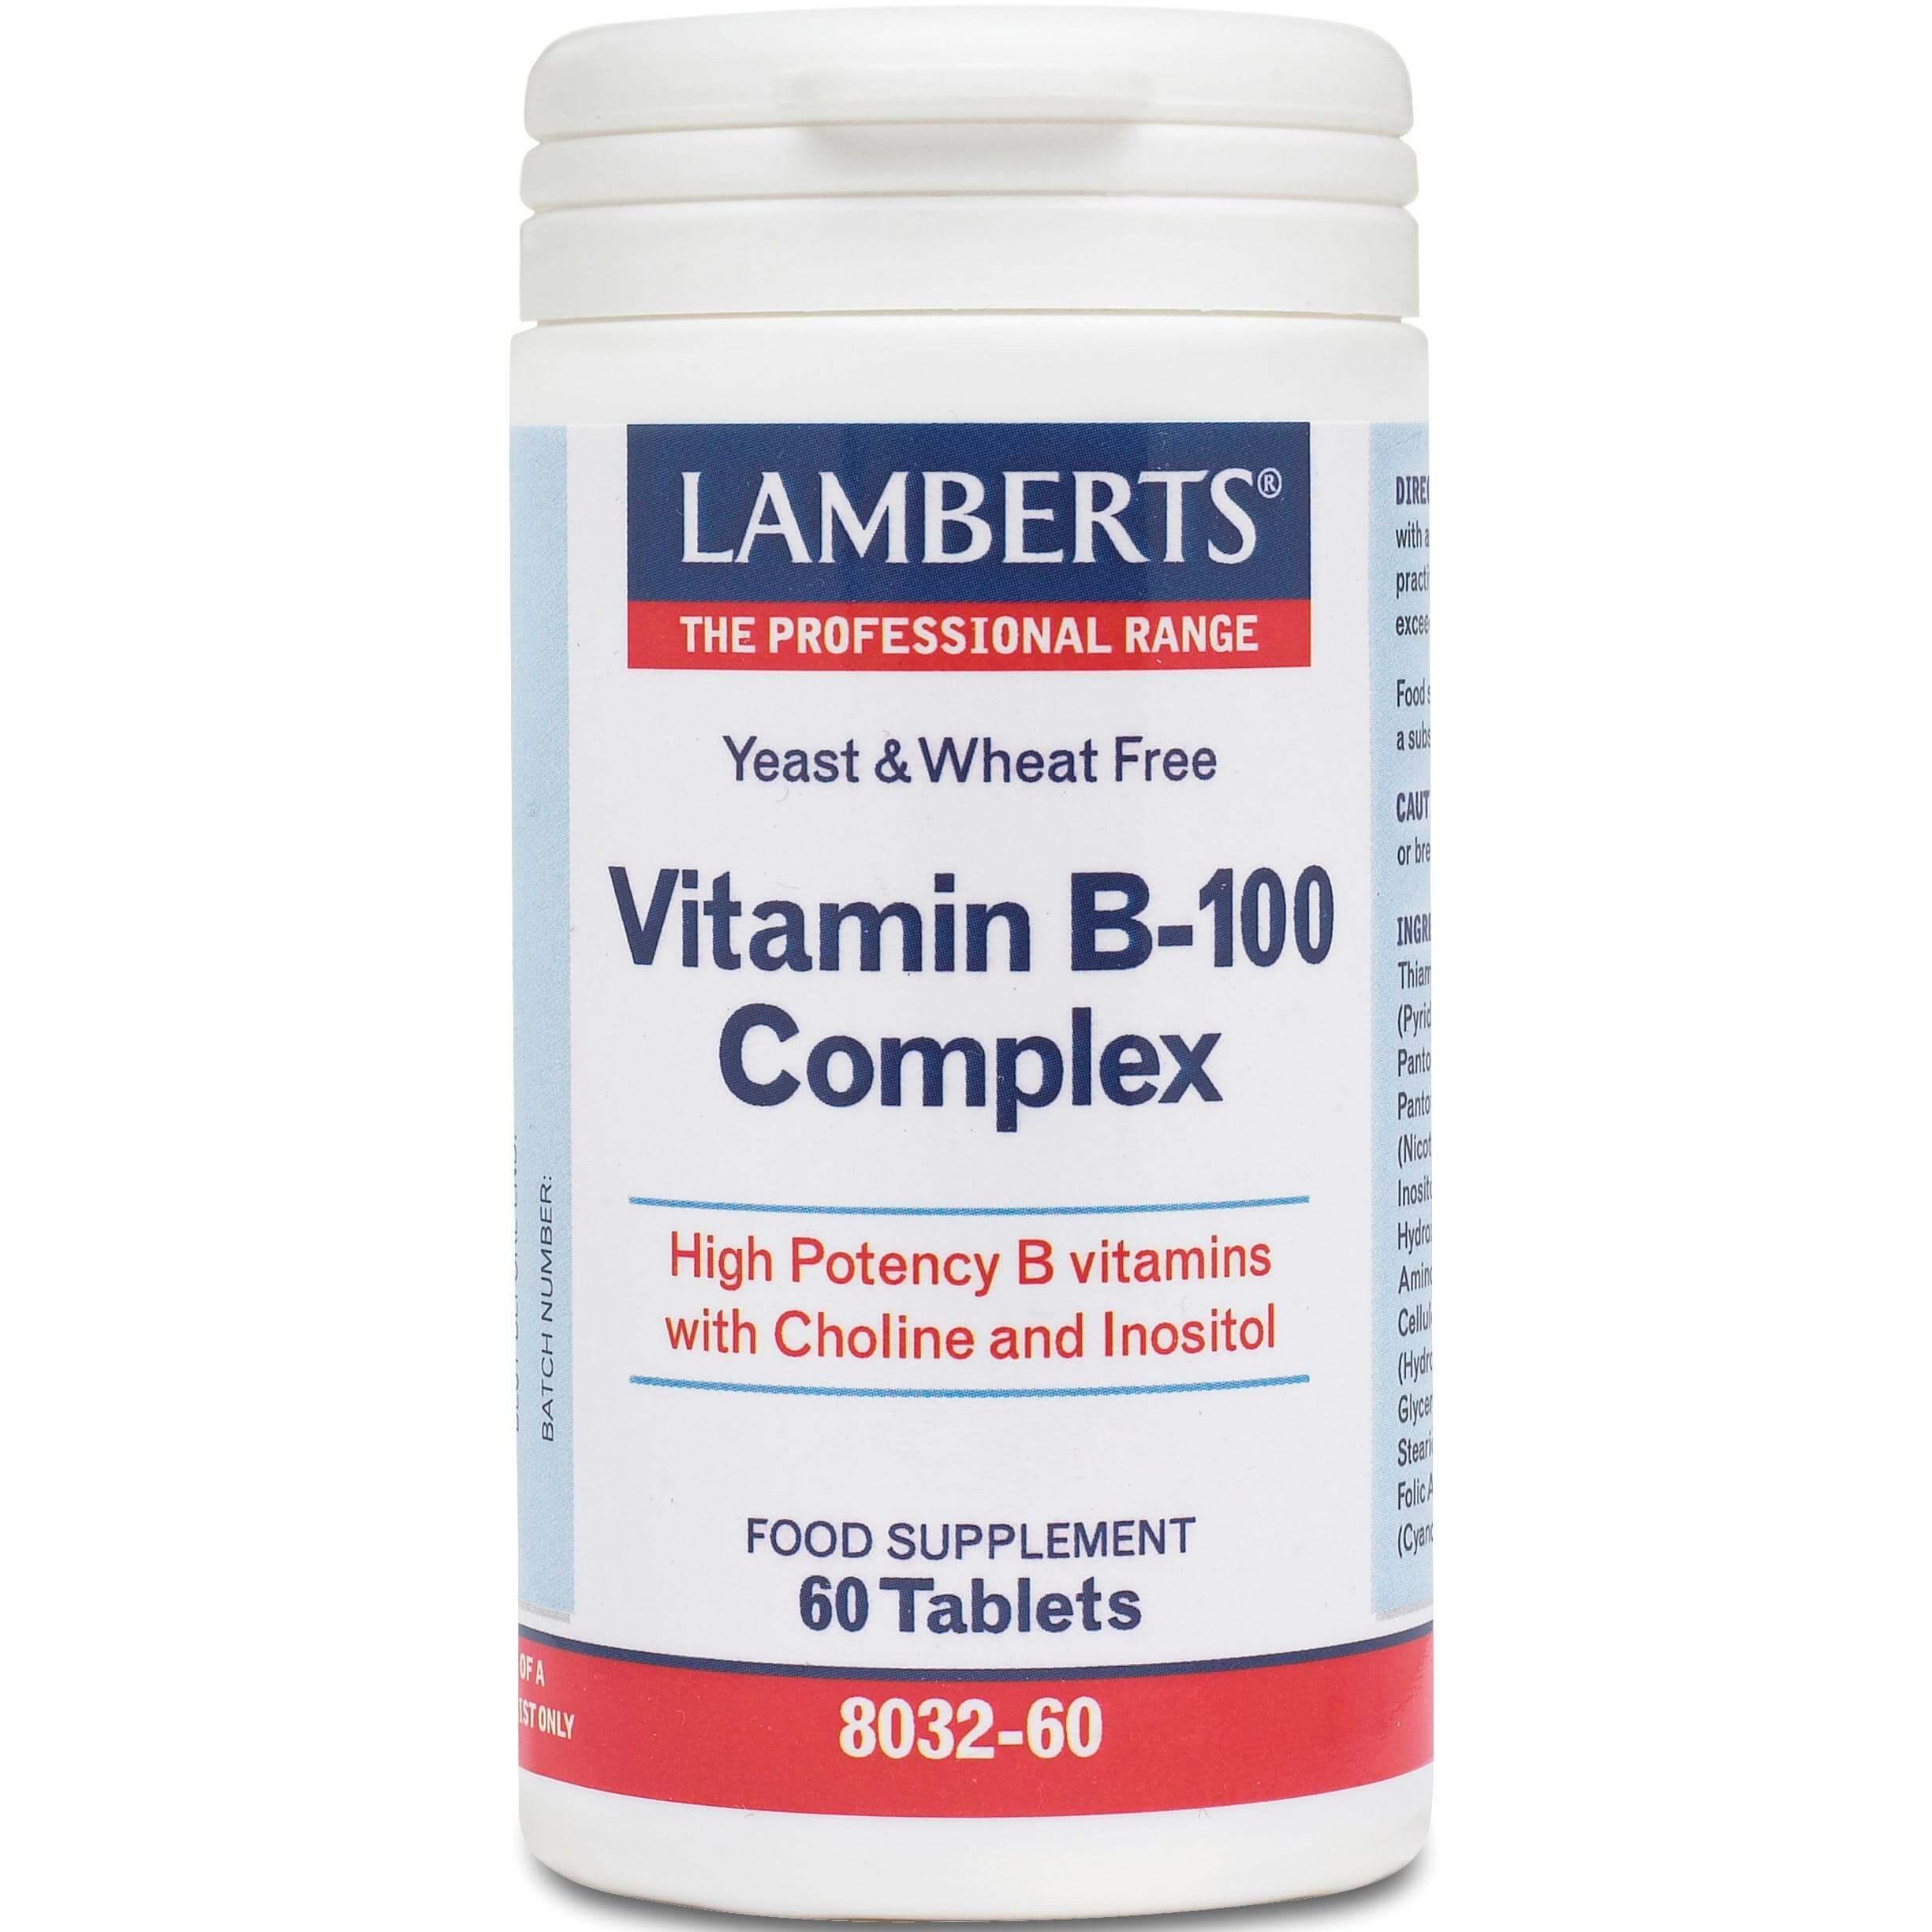 Lamberts B-100 Complex Συμπλήρωμα Διατροφής για Υγιές Νευρικό και Πεπτικό Σύστημ υγεία ευεξία   βότανα βιταμίνες   βιταμίνες b  c  βιοφλαβονοειδή